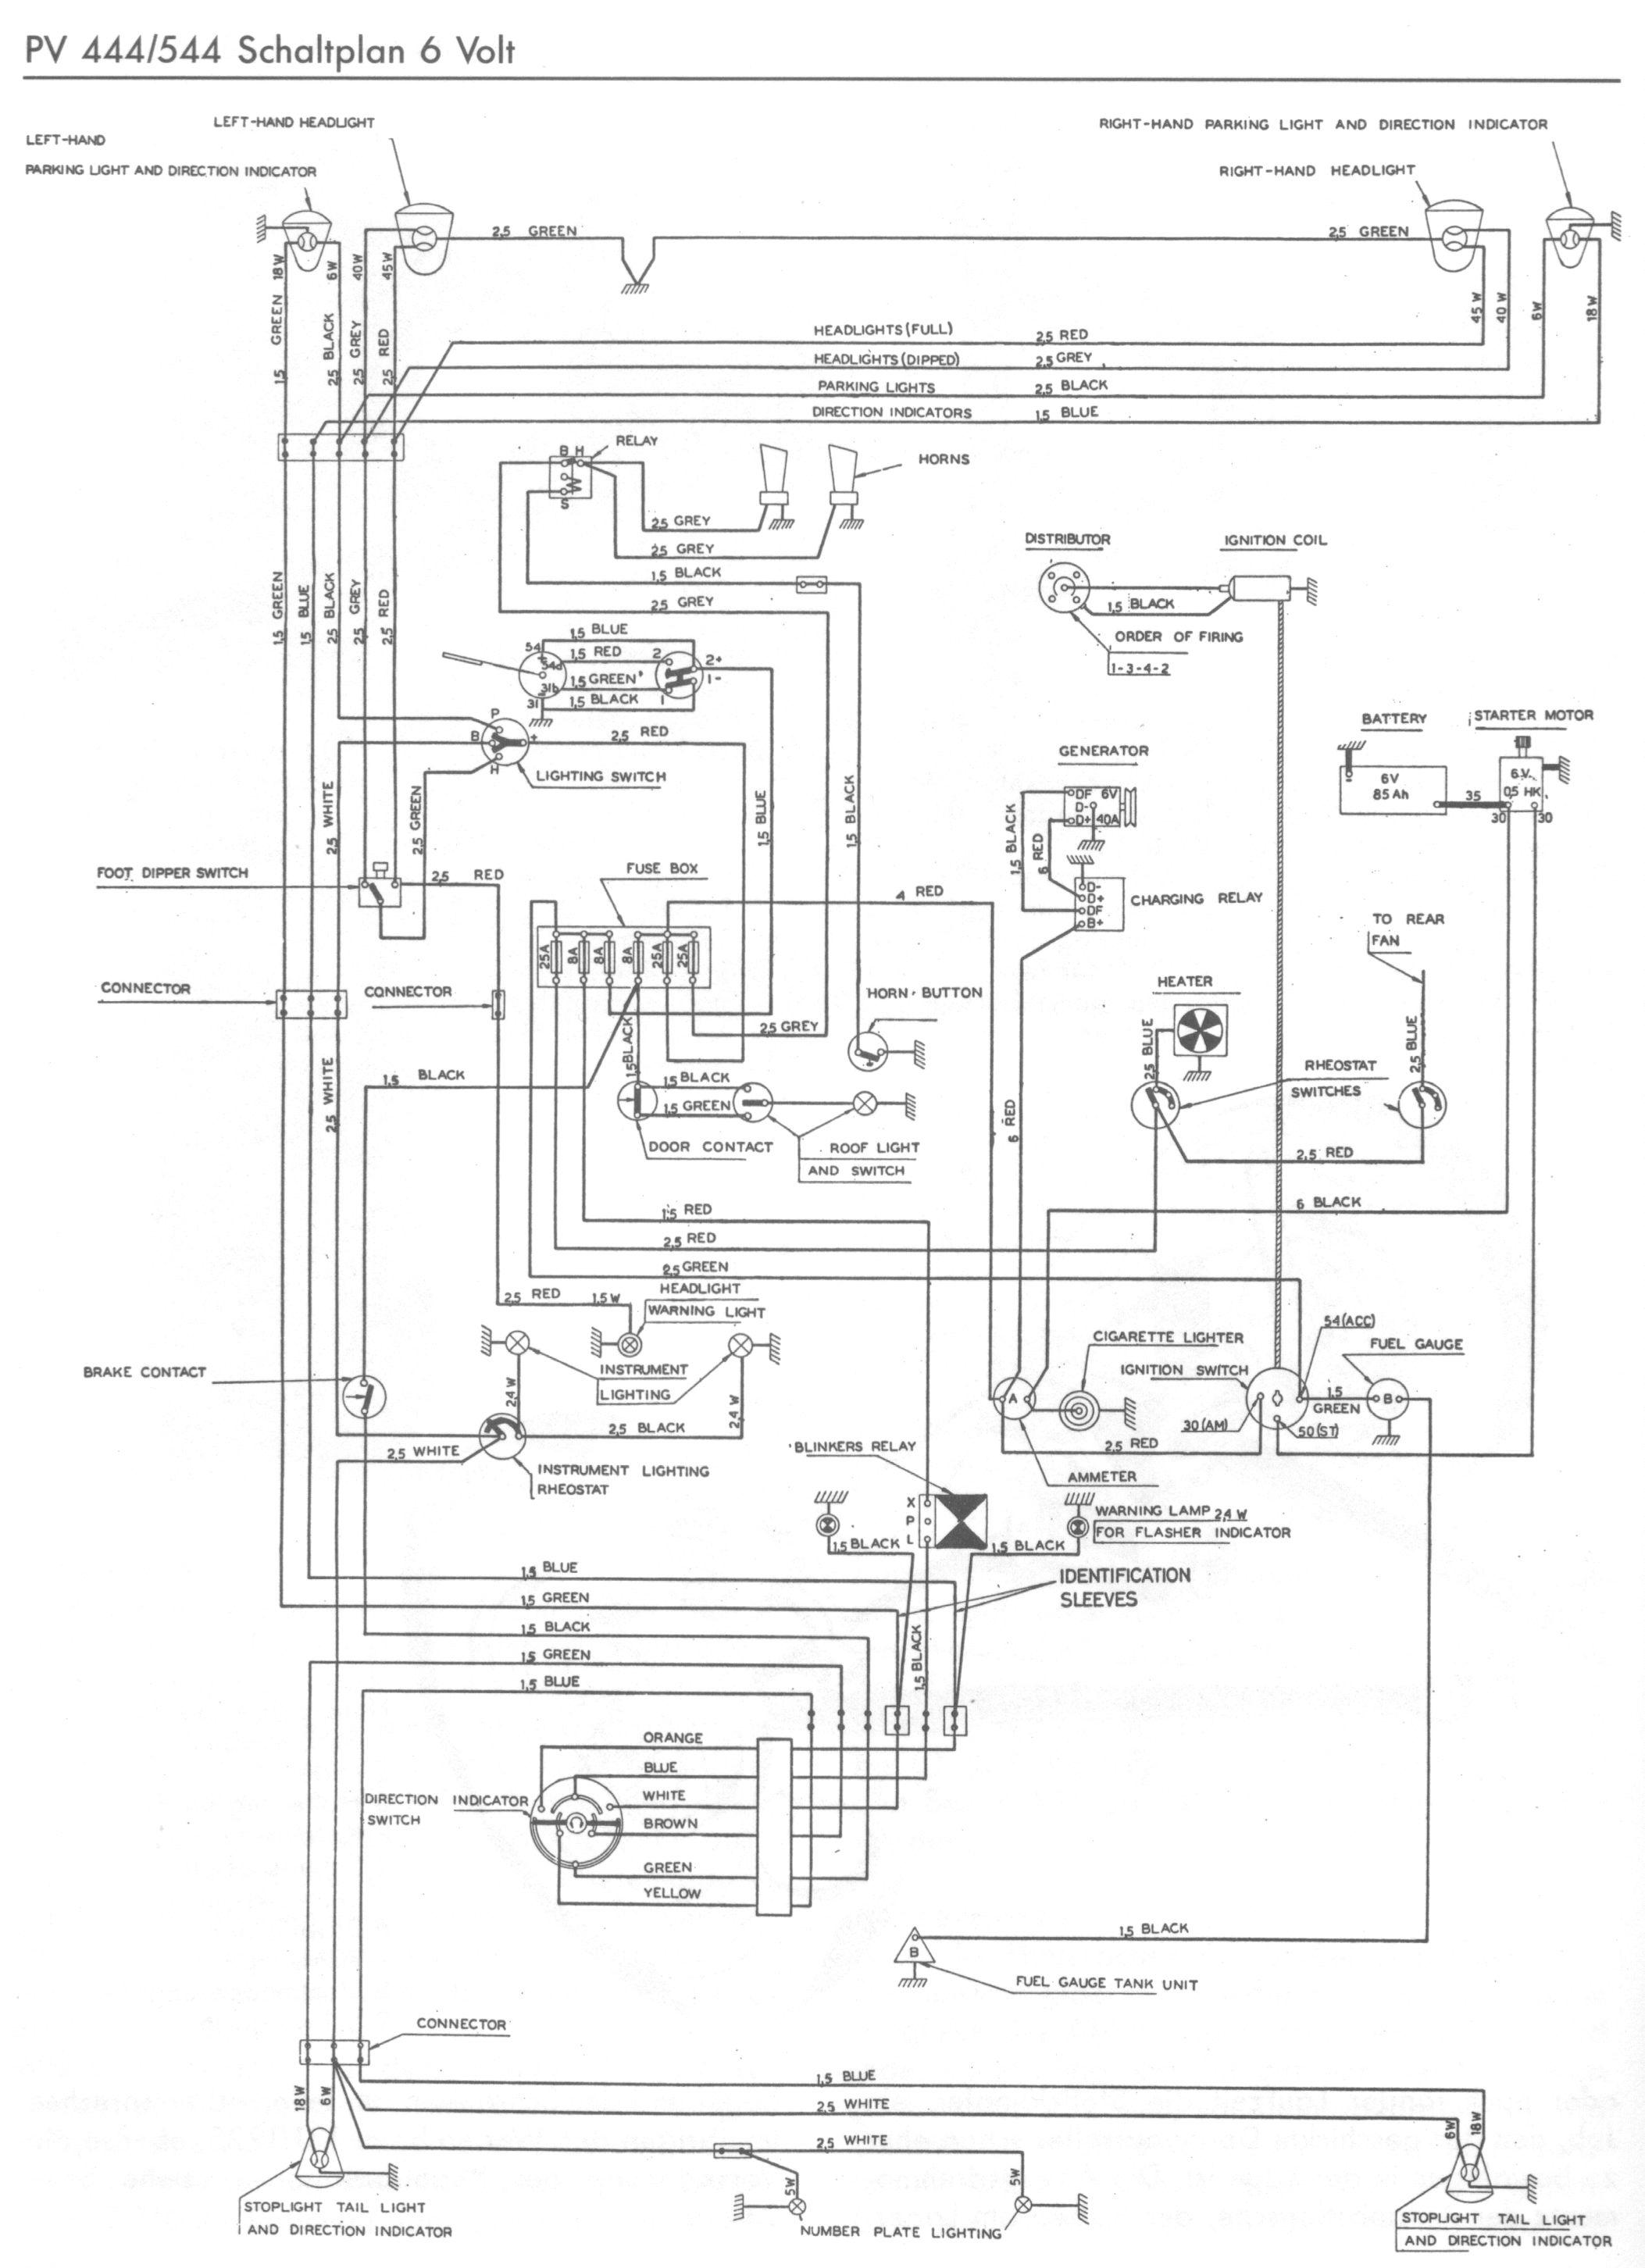 irrigation del Schaltplan